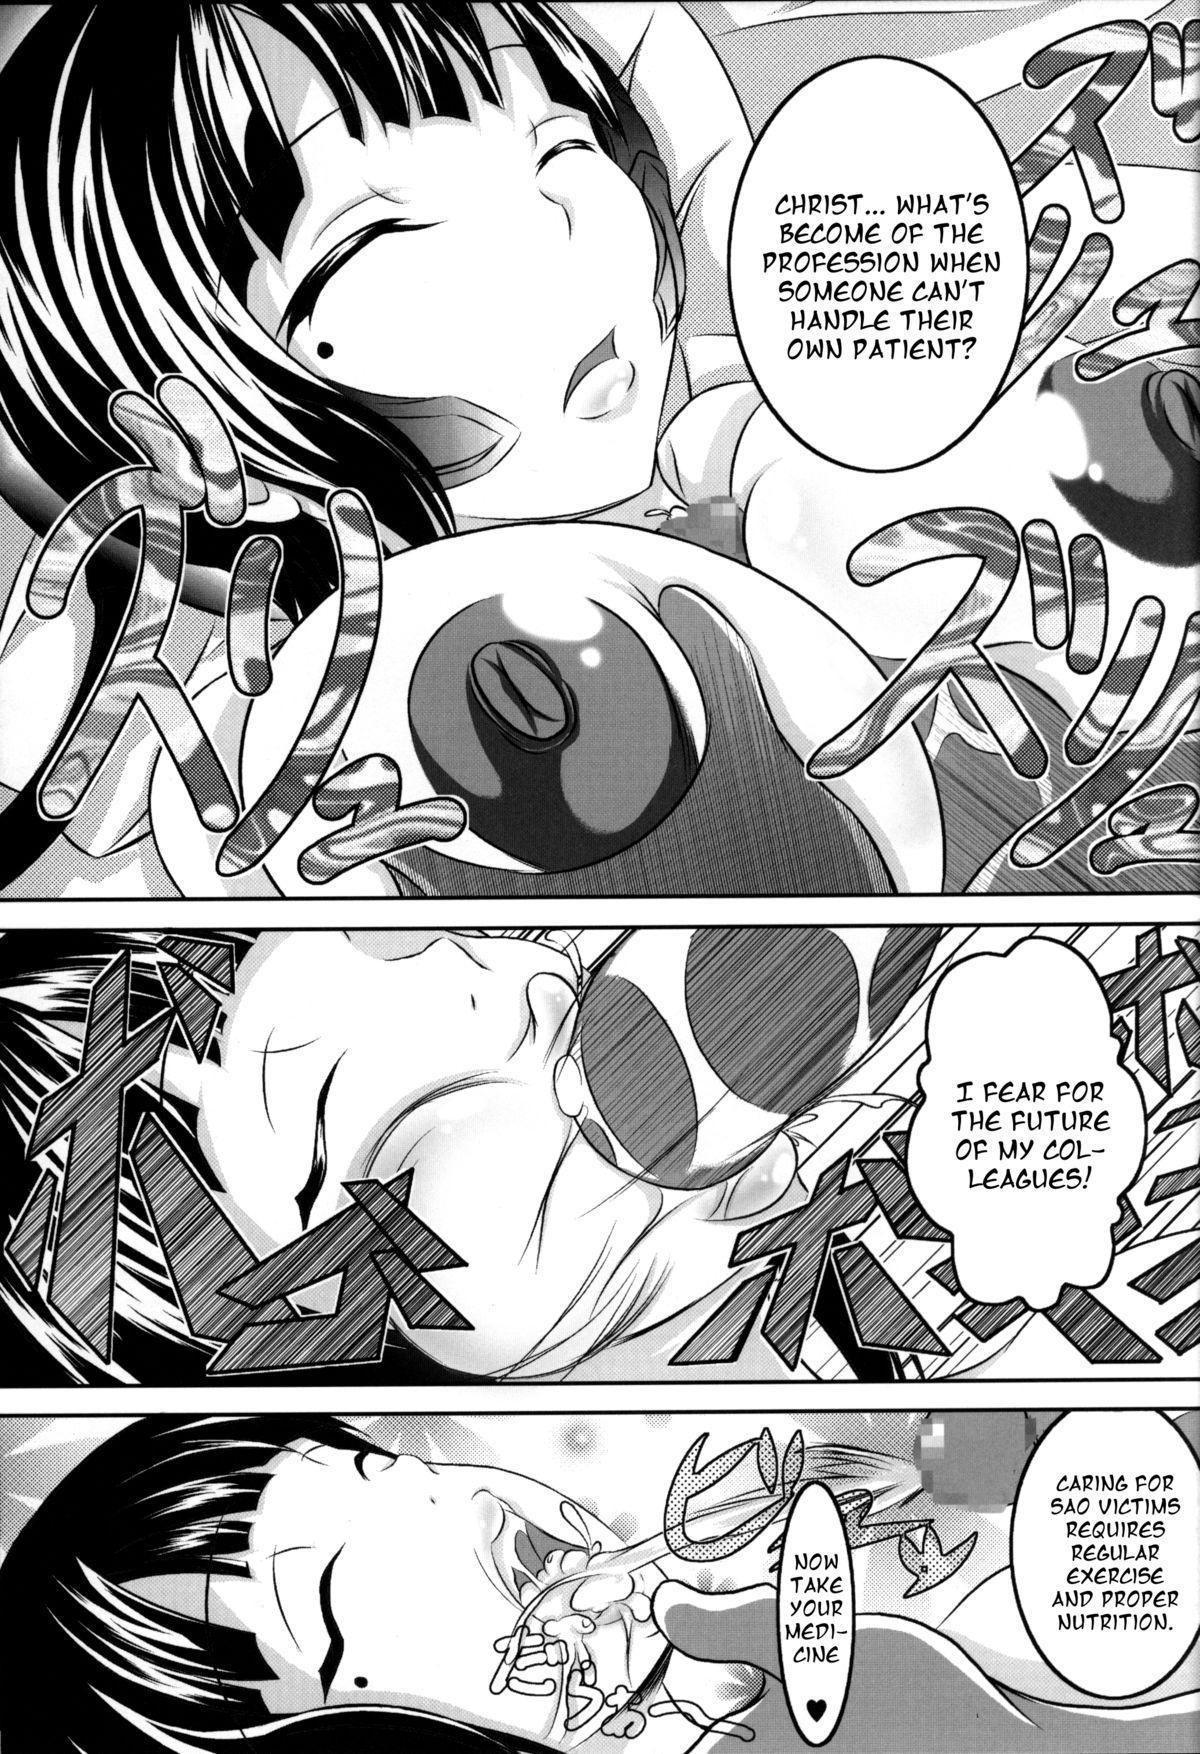 Irakabeshi Sugite Atama ga Okashiku Natta Hito ga Kangaeta SAO-hon | A SAO Book Drawn by a Man Driven Insane by Bashing his Head Against a Wall 12